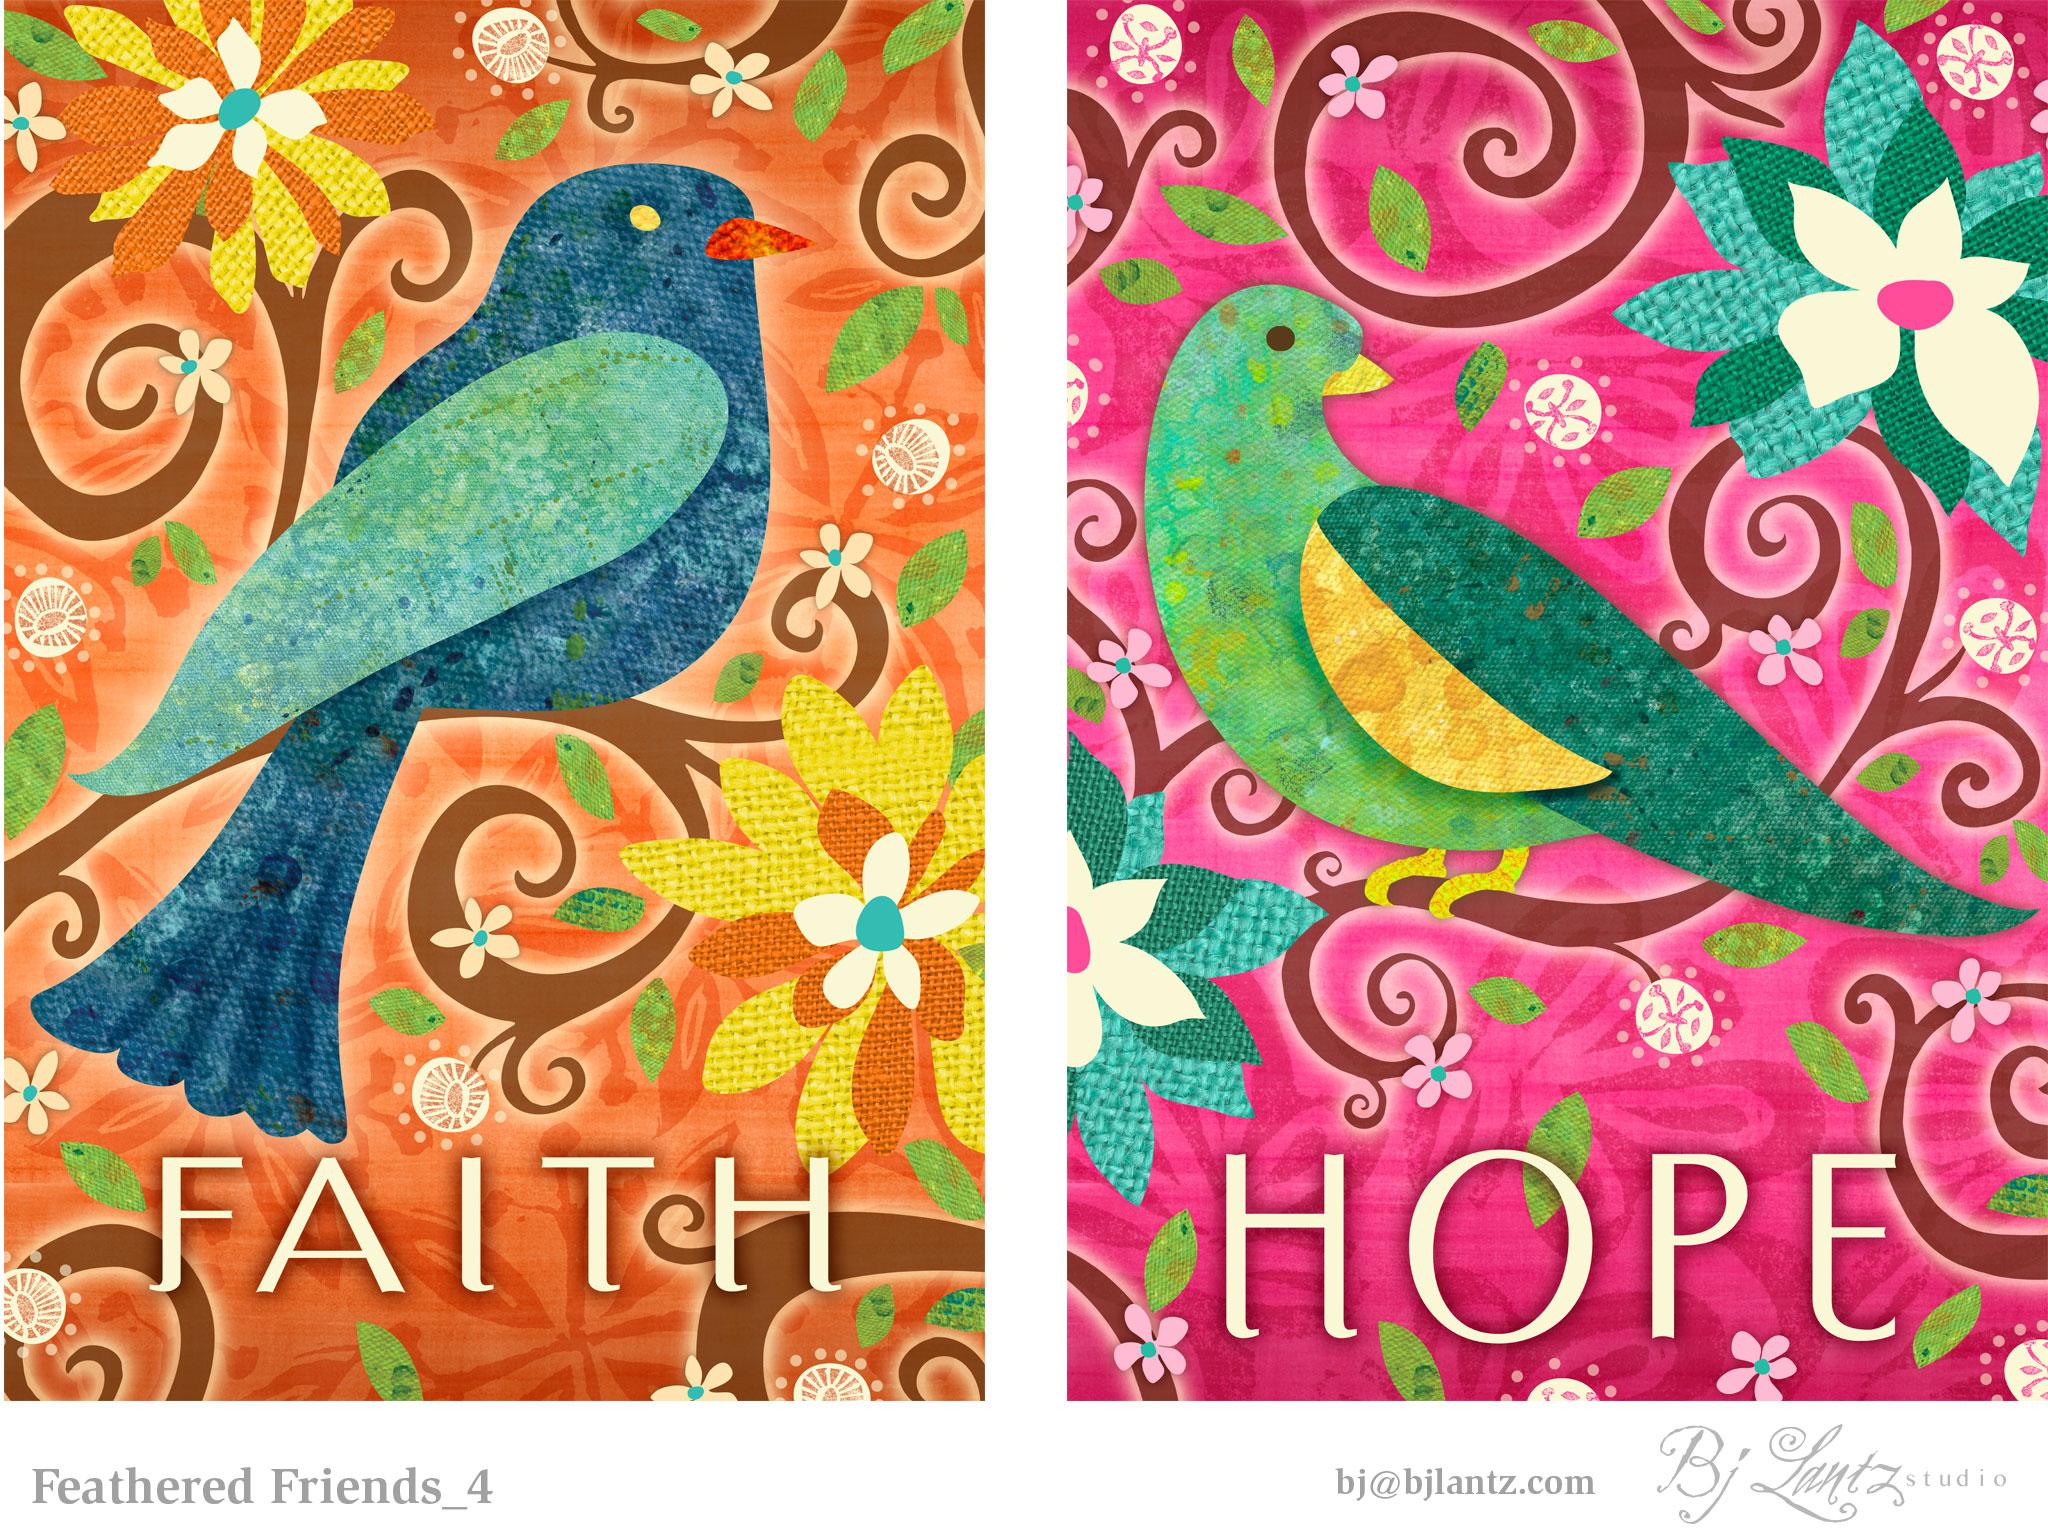 FeatheredFriends_4_BJLantz_portfolio.jpg